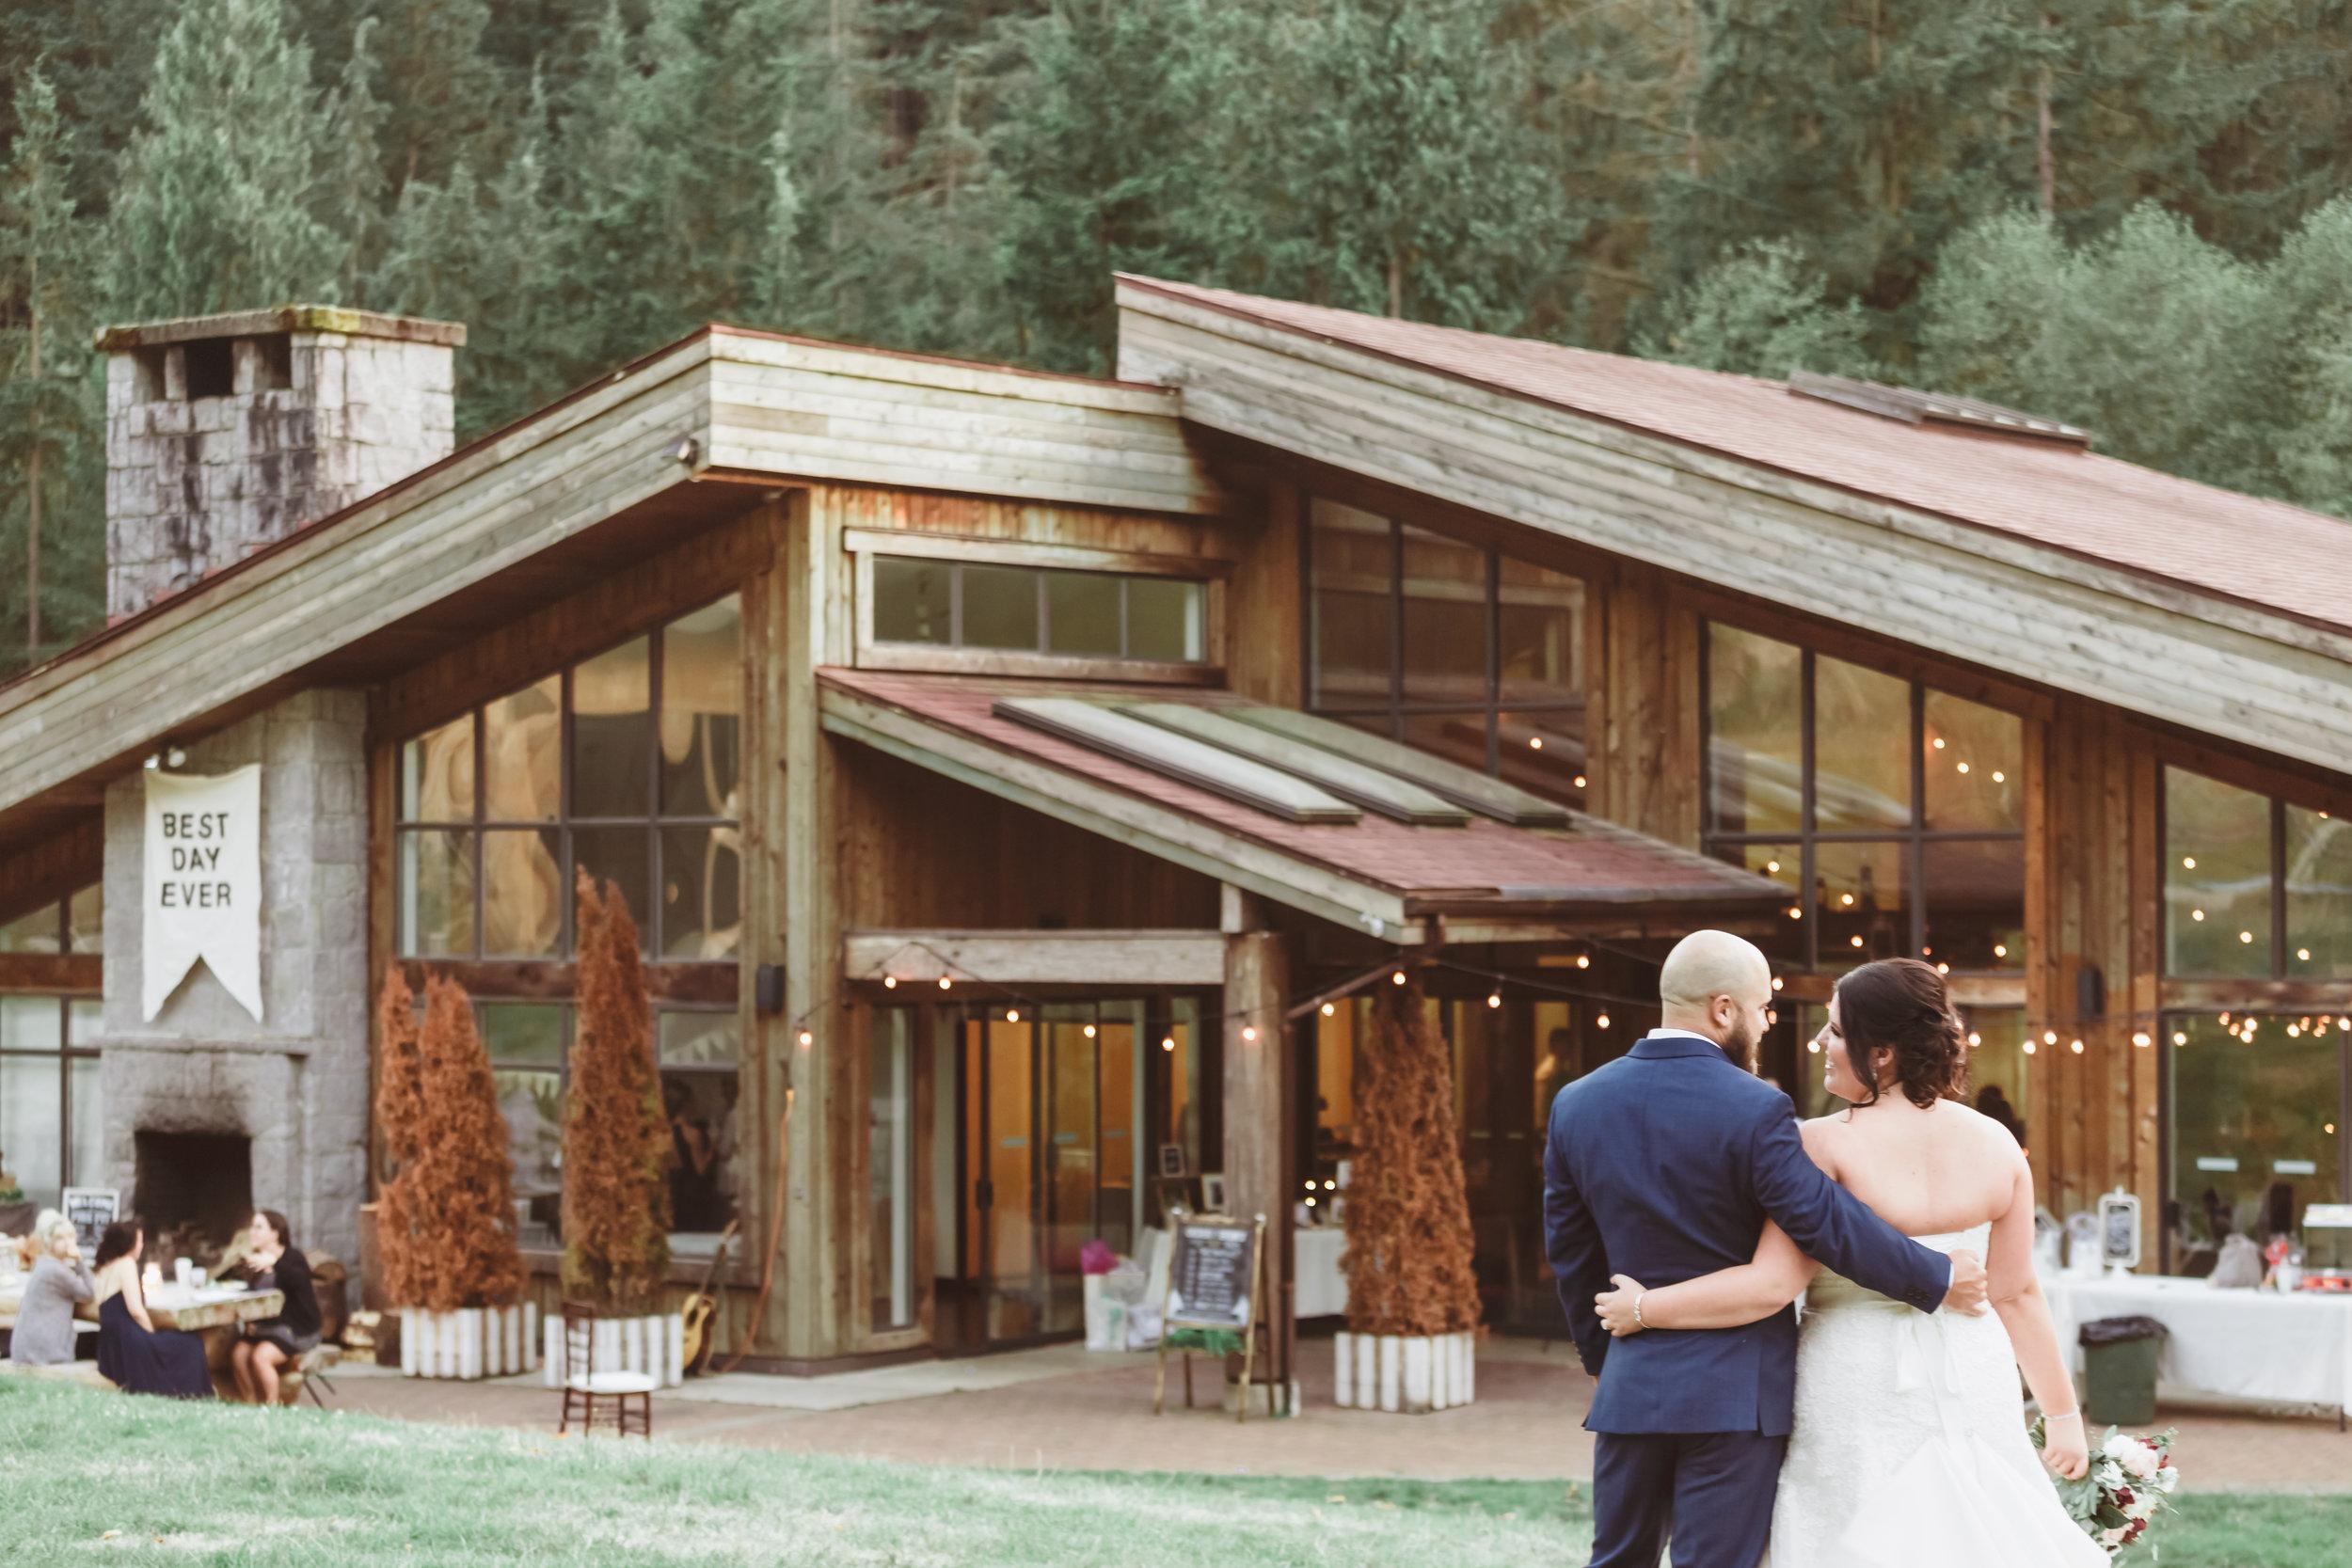 Vancouver Wedding Day Photo